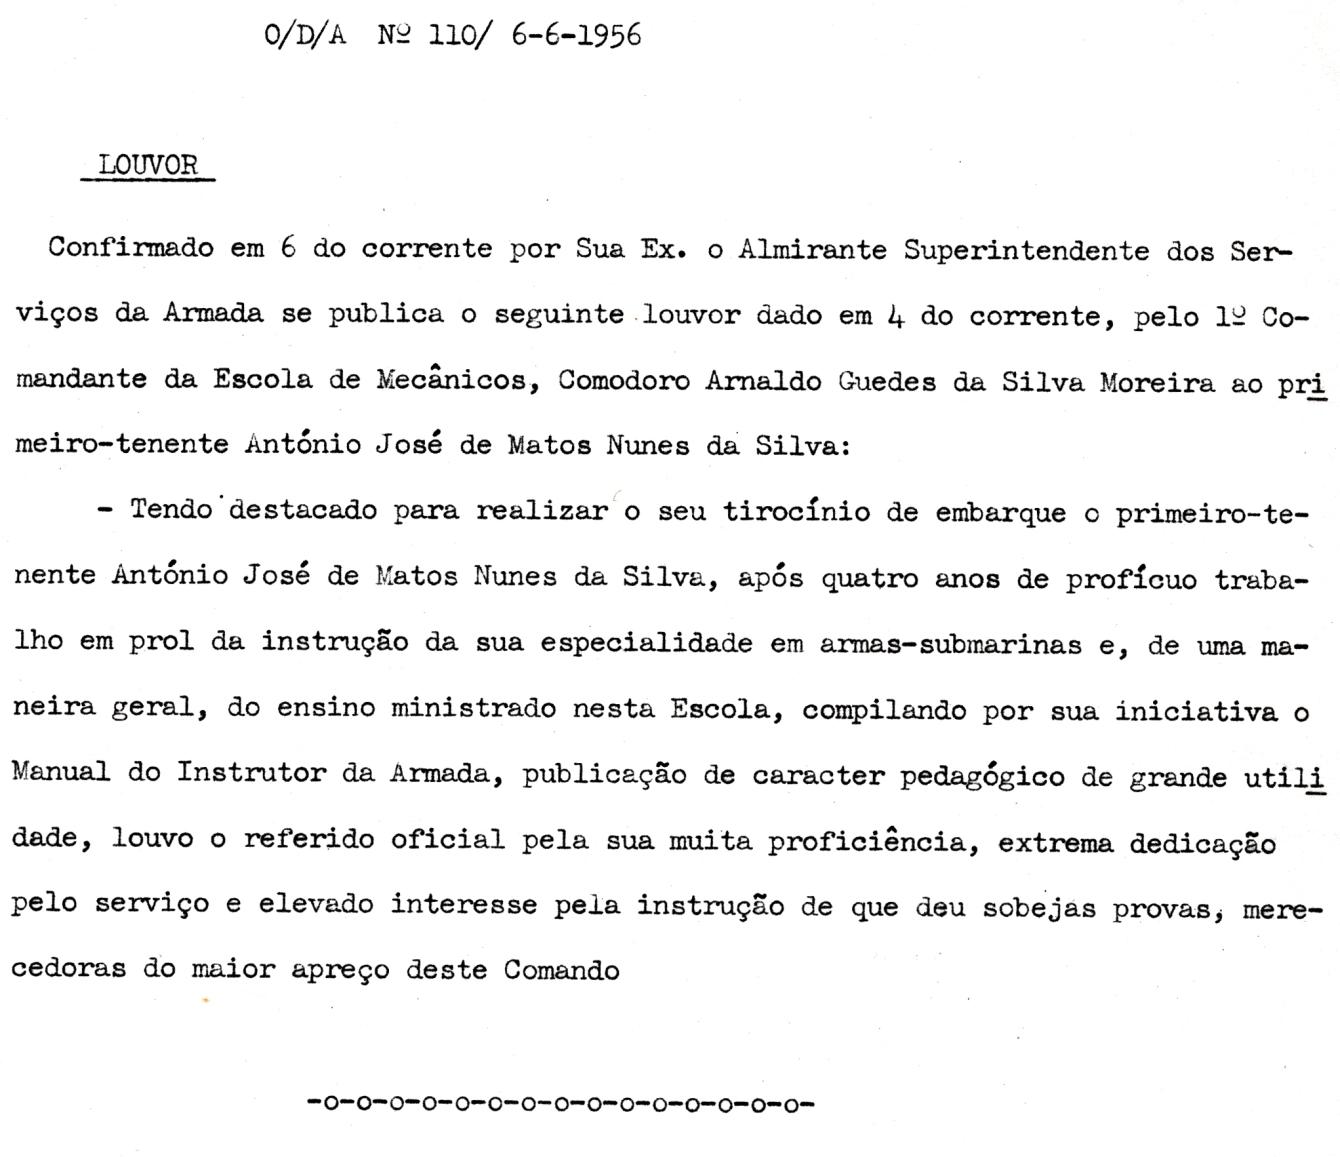 00297 956-06-06 Louvor do Comandante da Escola de Mecânicos -ODA 110 de 6-6-1956